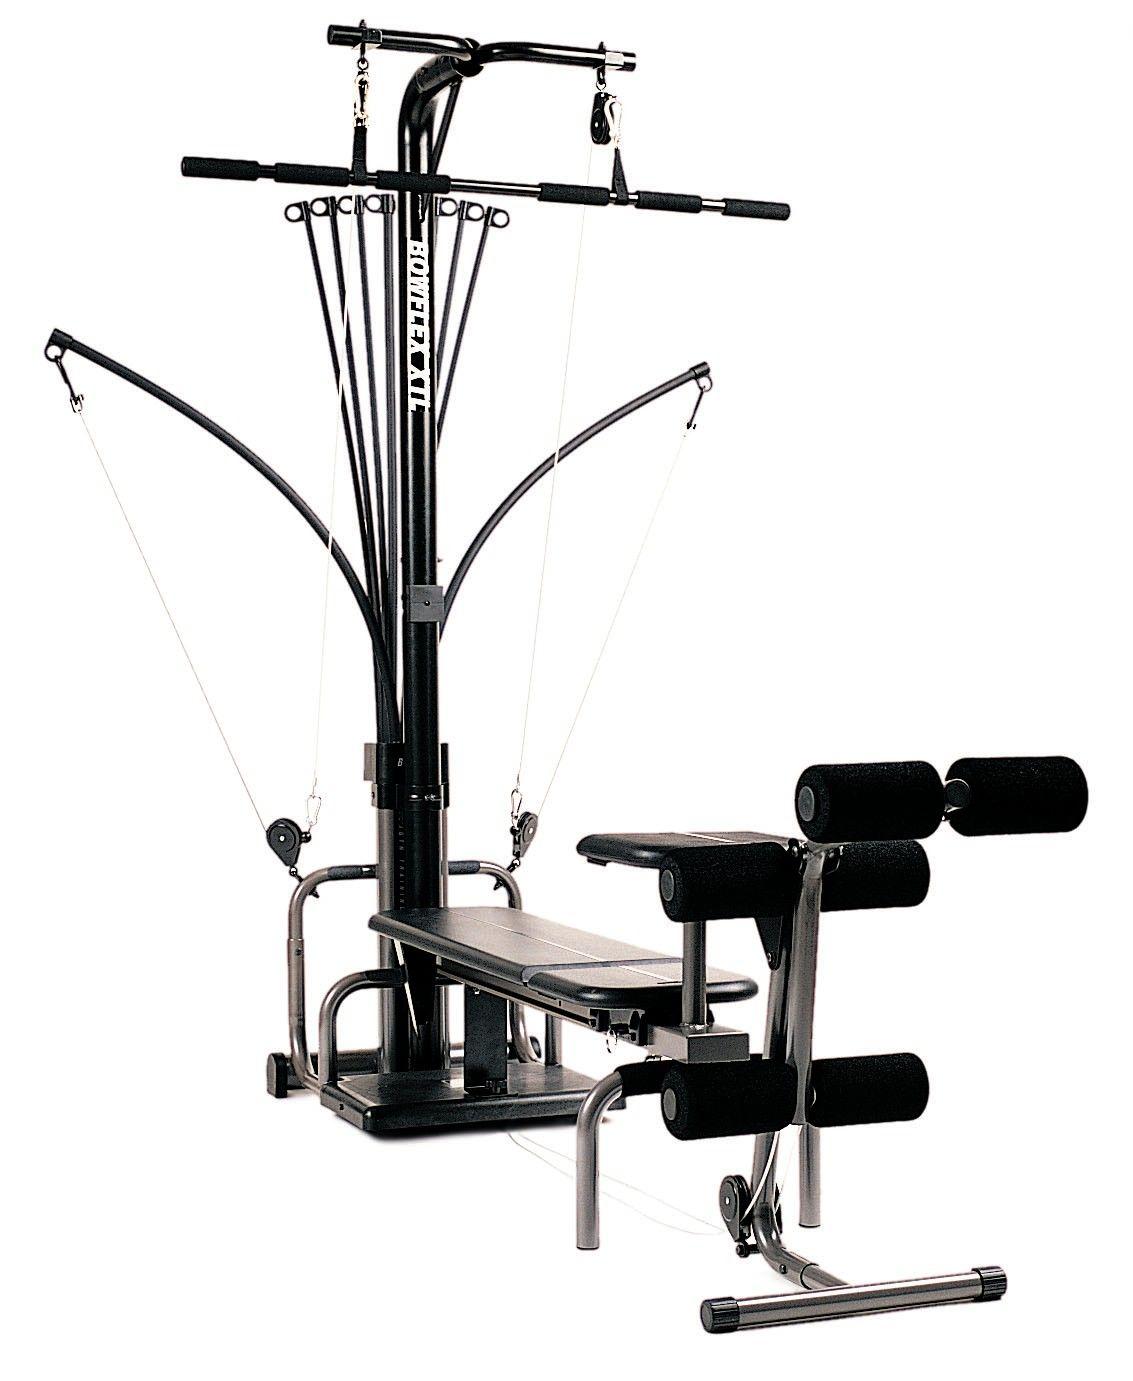 Bowflex xlt power pro workout equipment we just bought